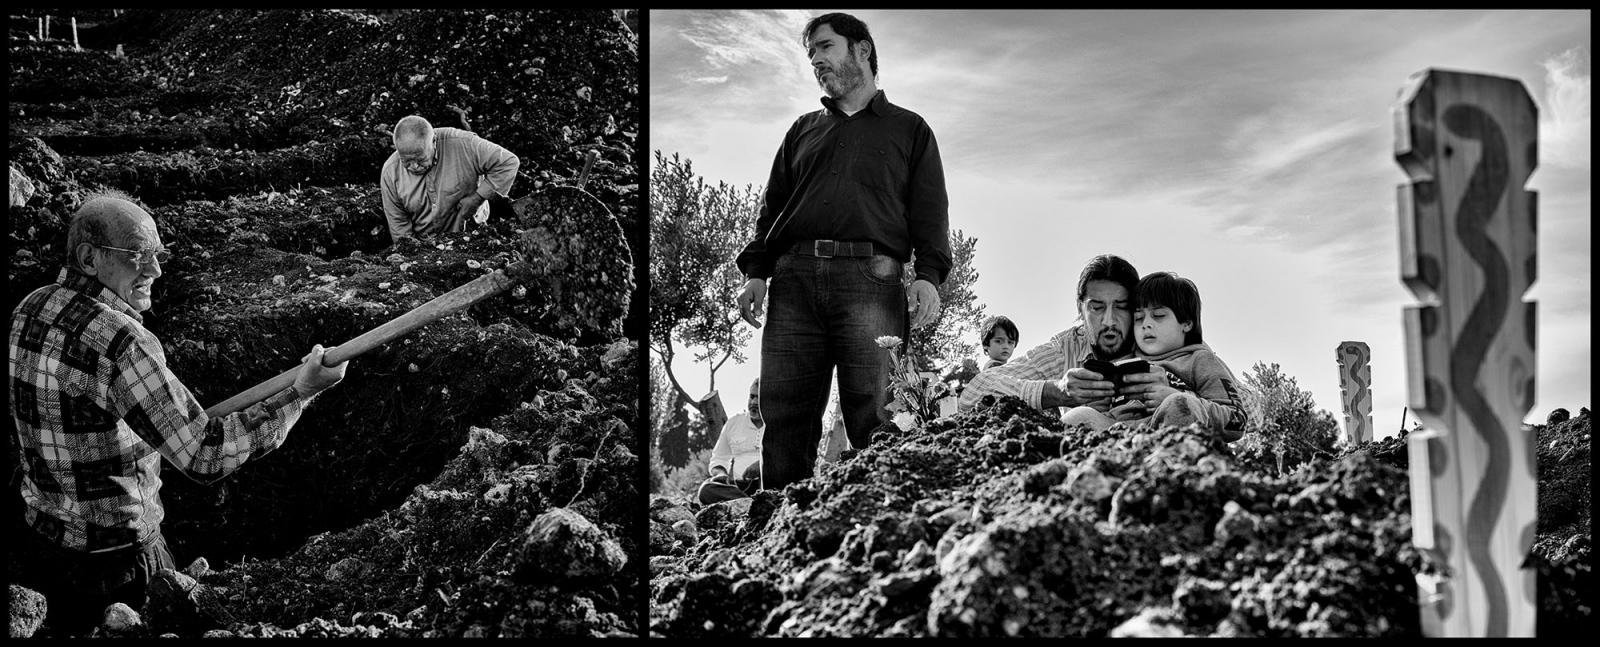 Art and Documentary Photography - Loading Nikos_Pilos_Stern_Goethe_institute_002.jpg